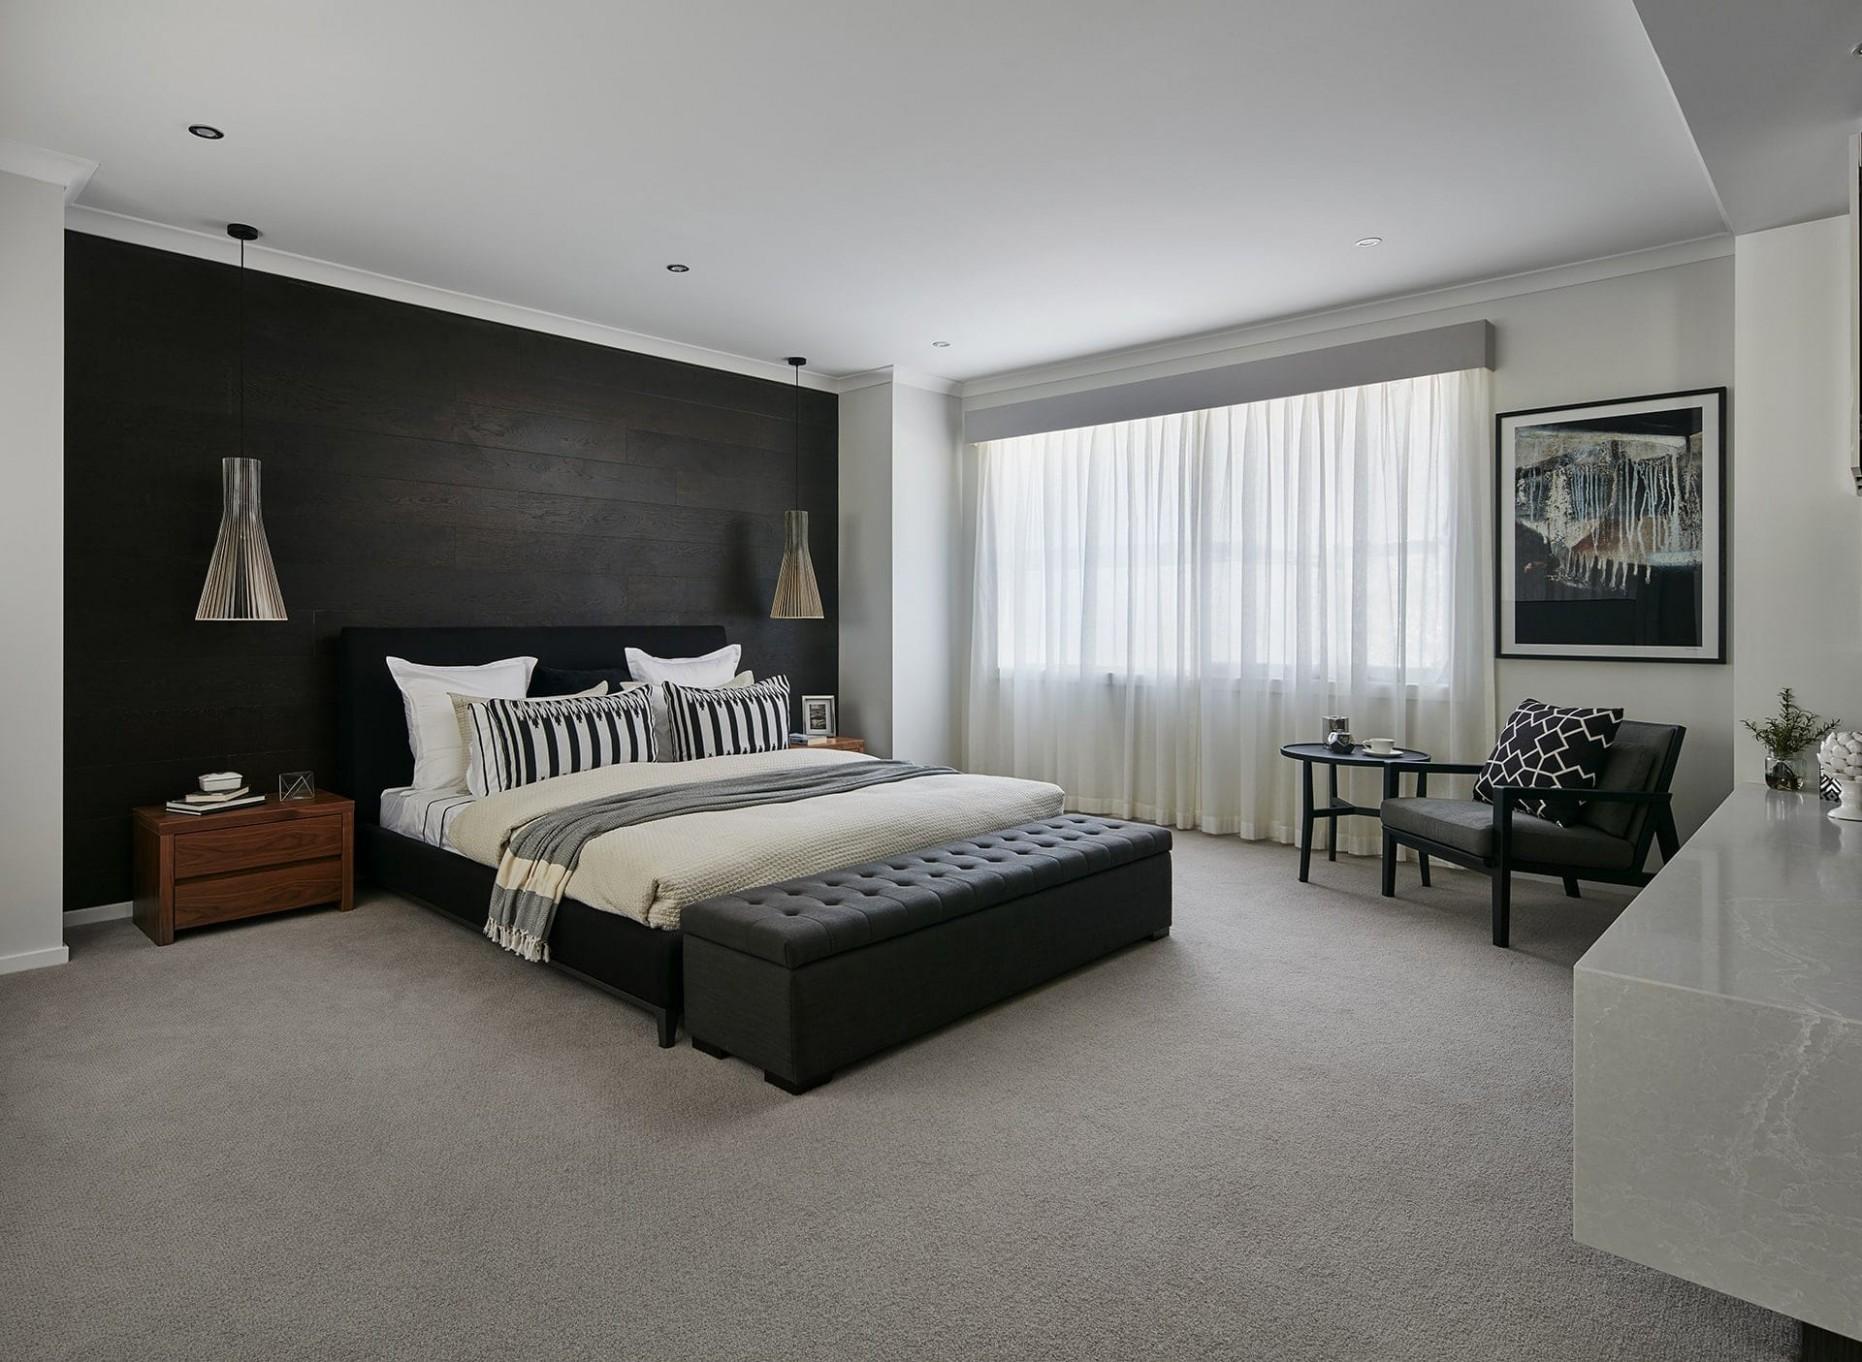 10 Dark Bedroom Wall Ideas to Embrace - TLC Interiors - Bedroom Ideas Dark